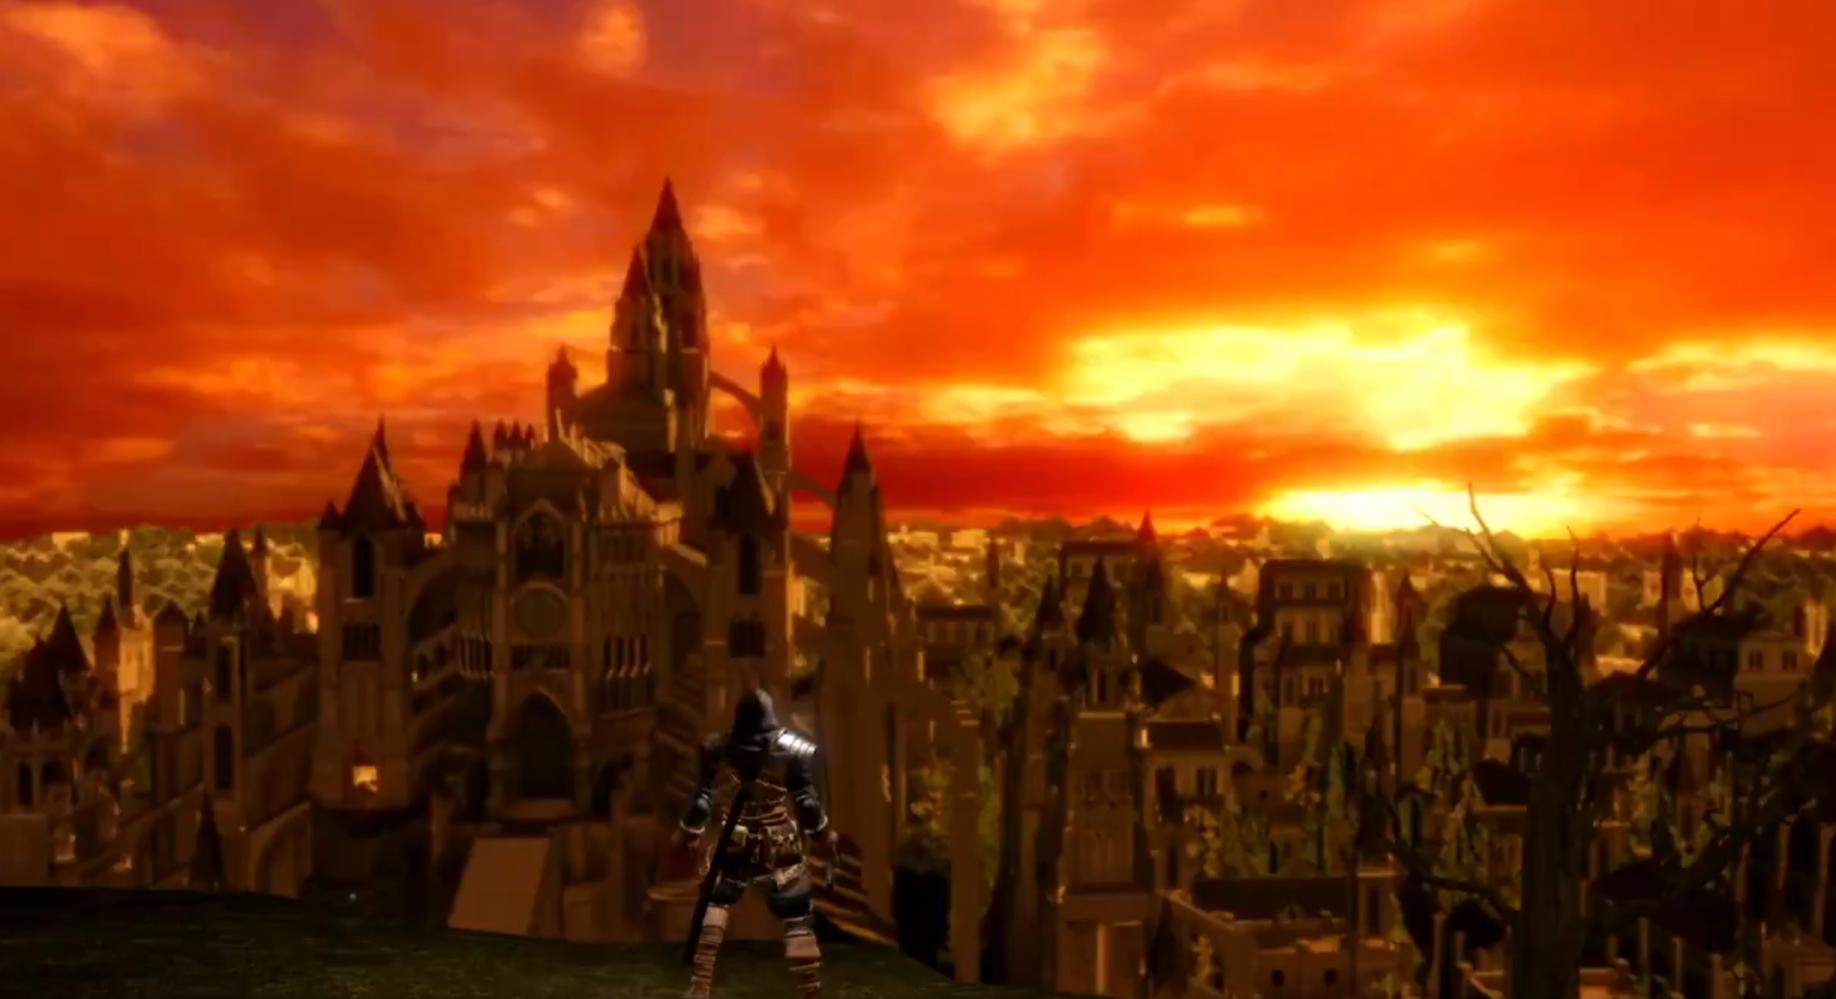 Dark Souls: Nightfall looks more like a sequel than a mod